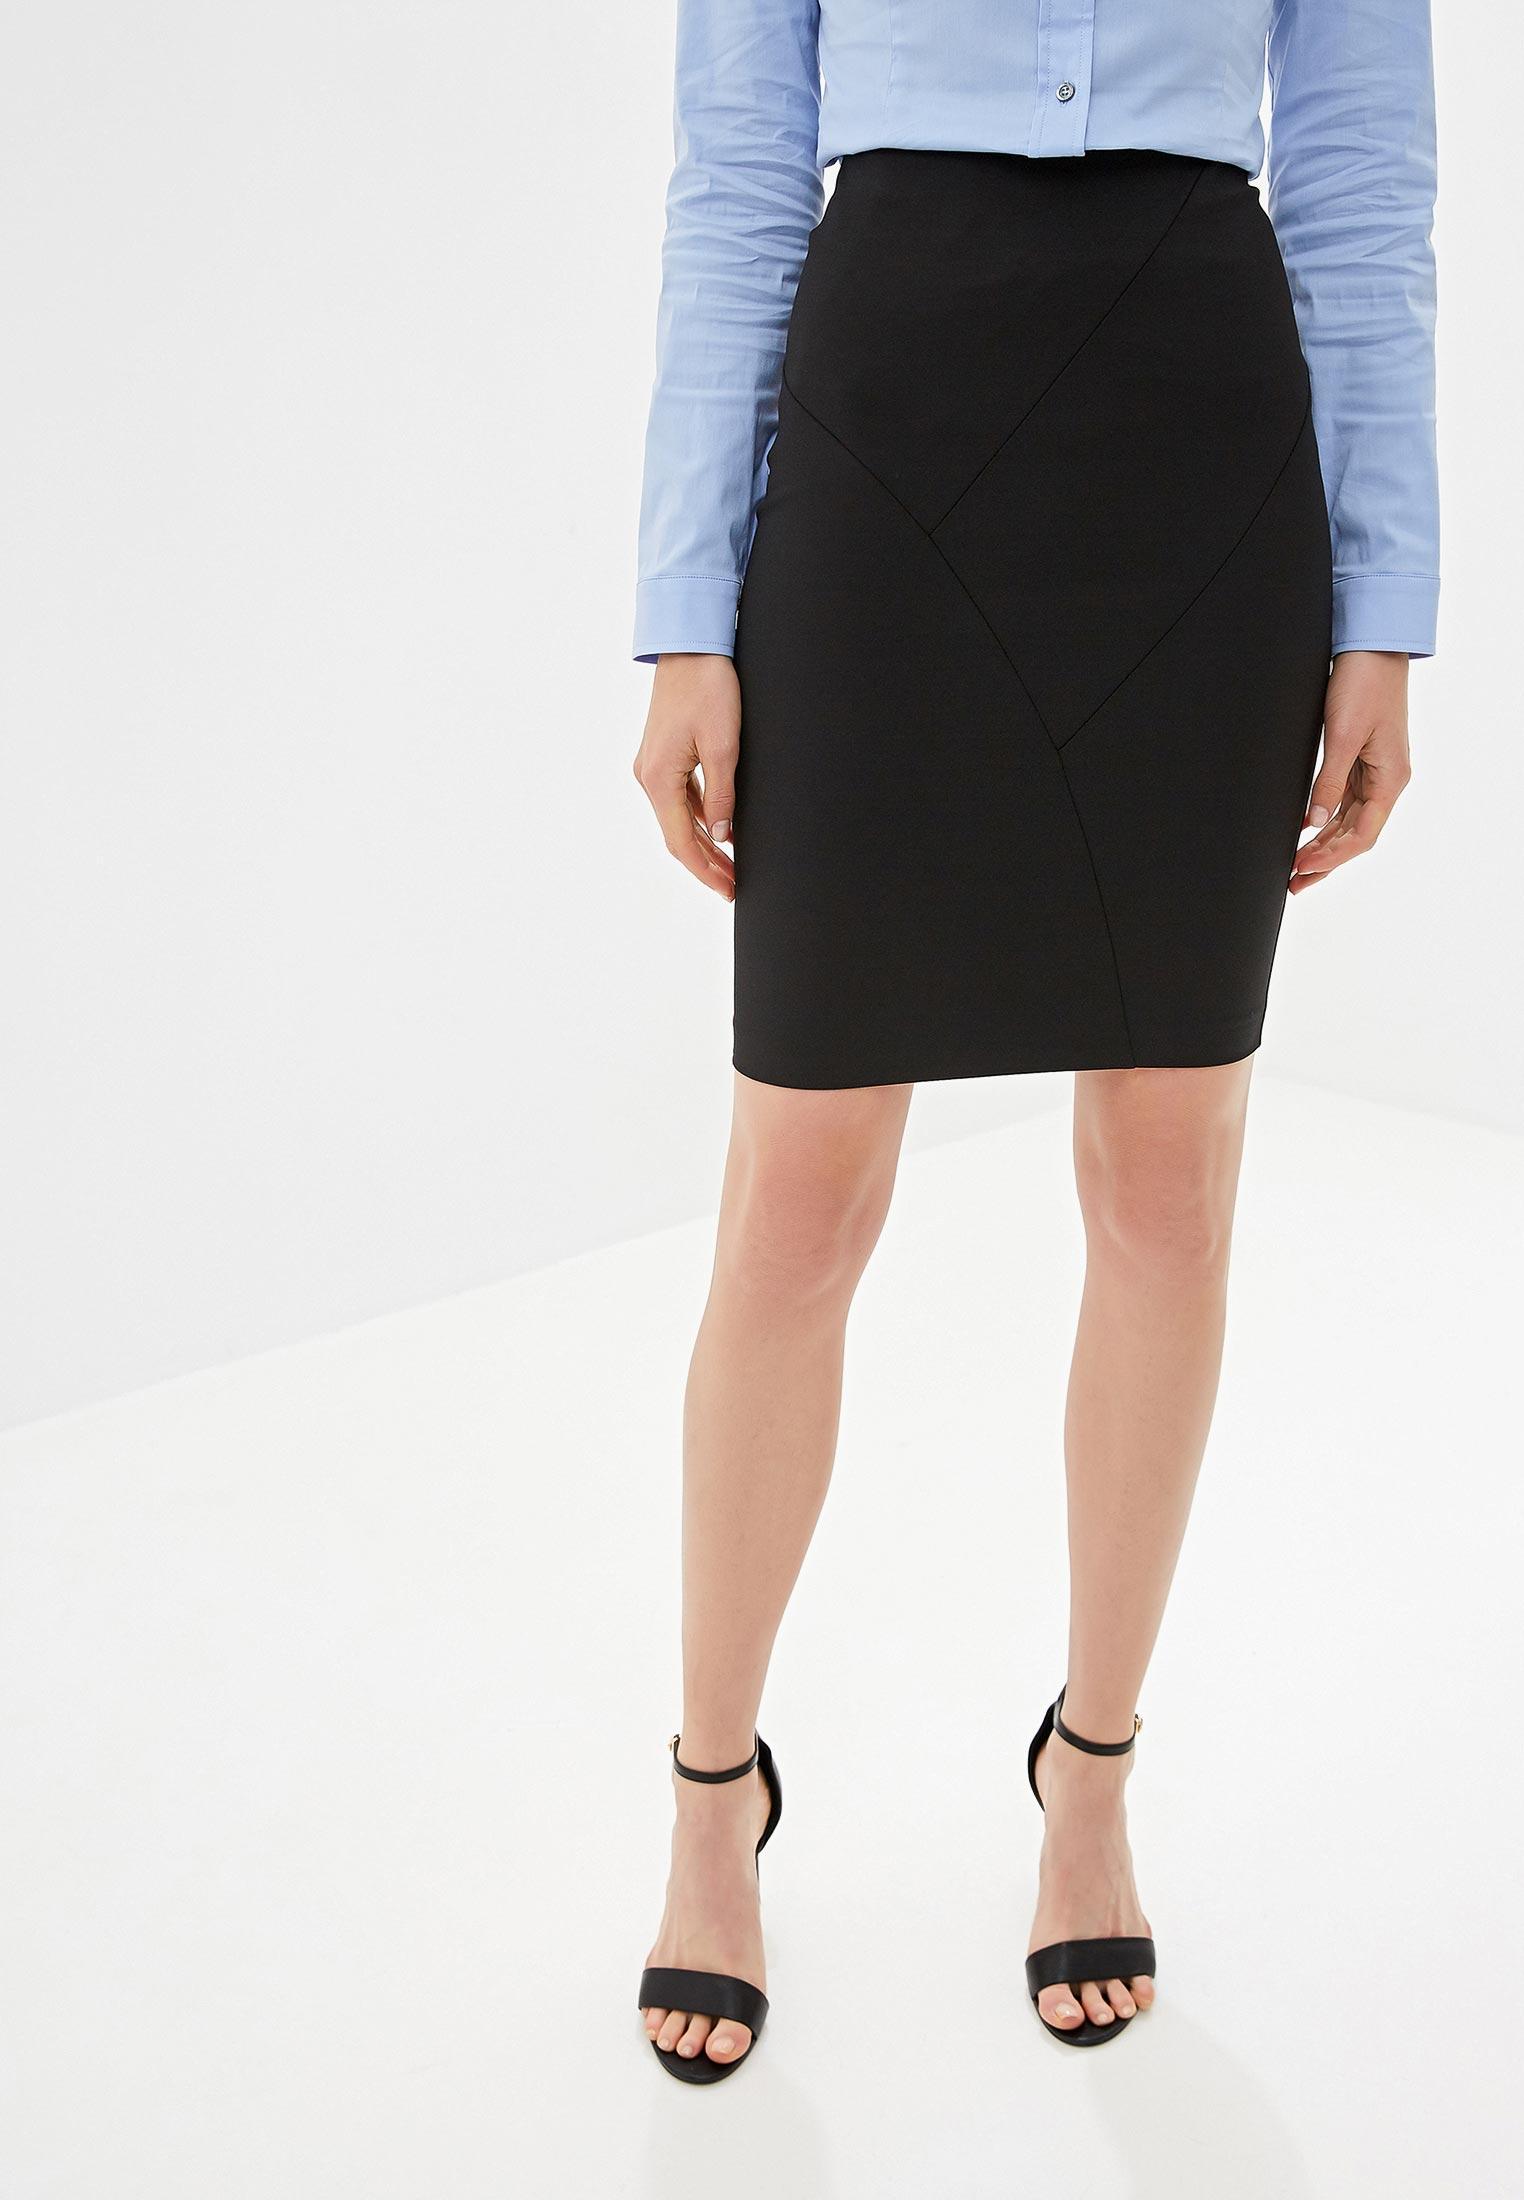 Узкая юбка Patrizia Pepe (Патриция Пепе) 8G0167